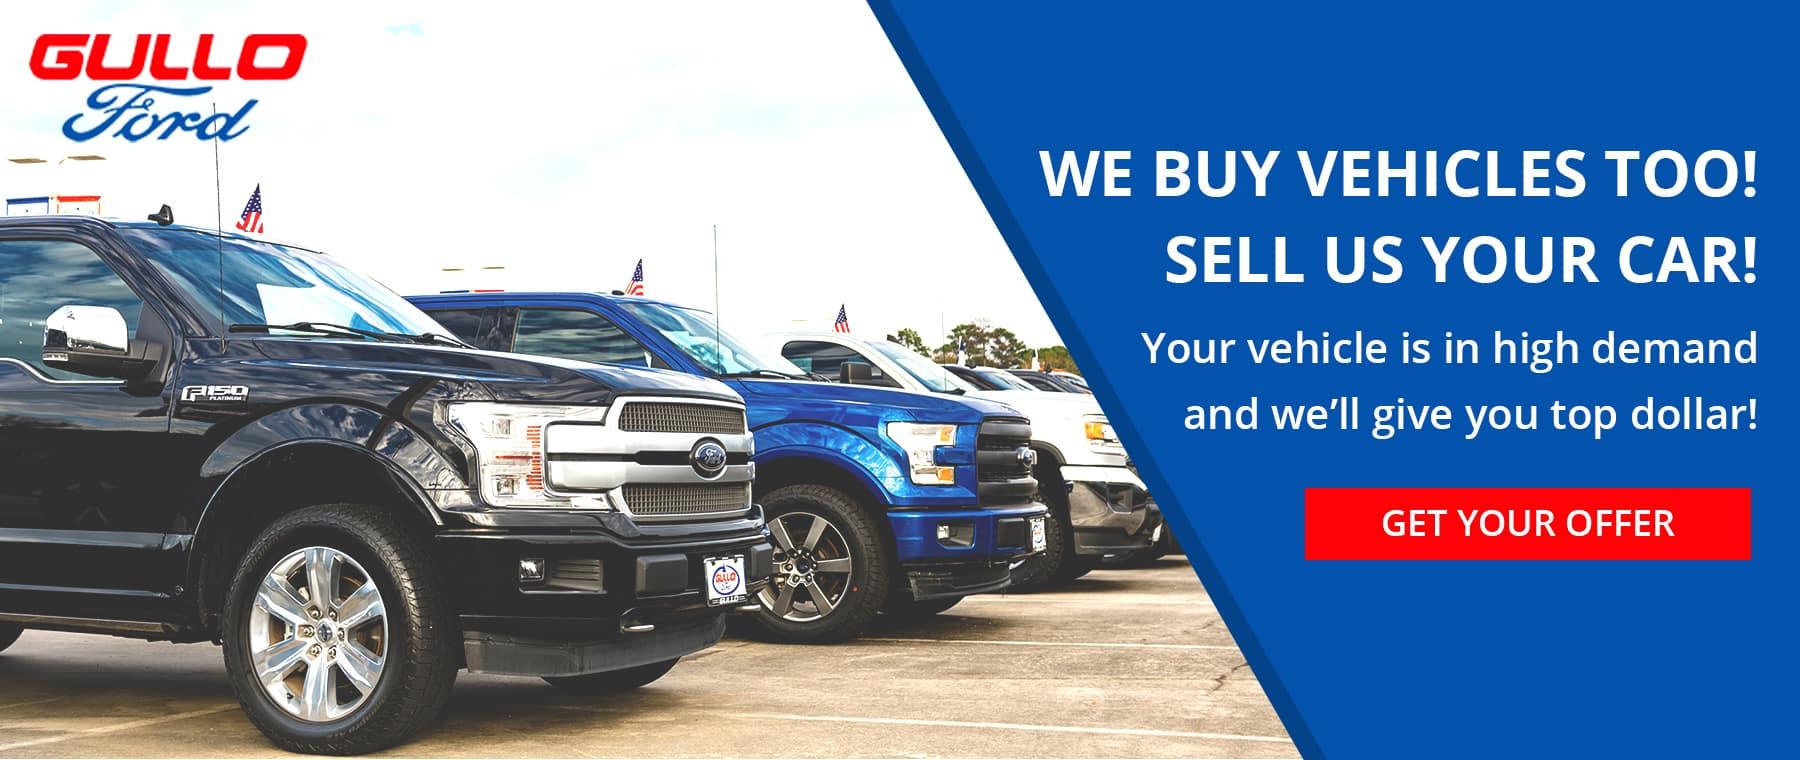 We buy vehicles